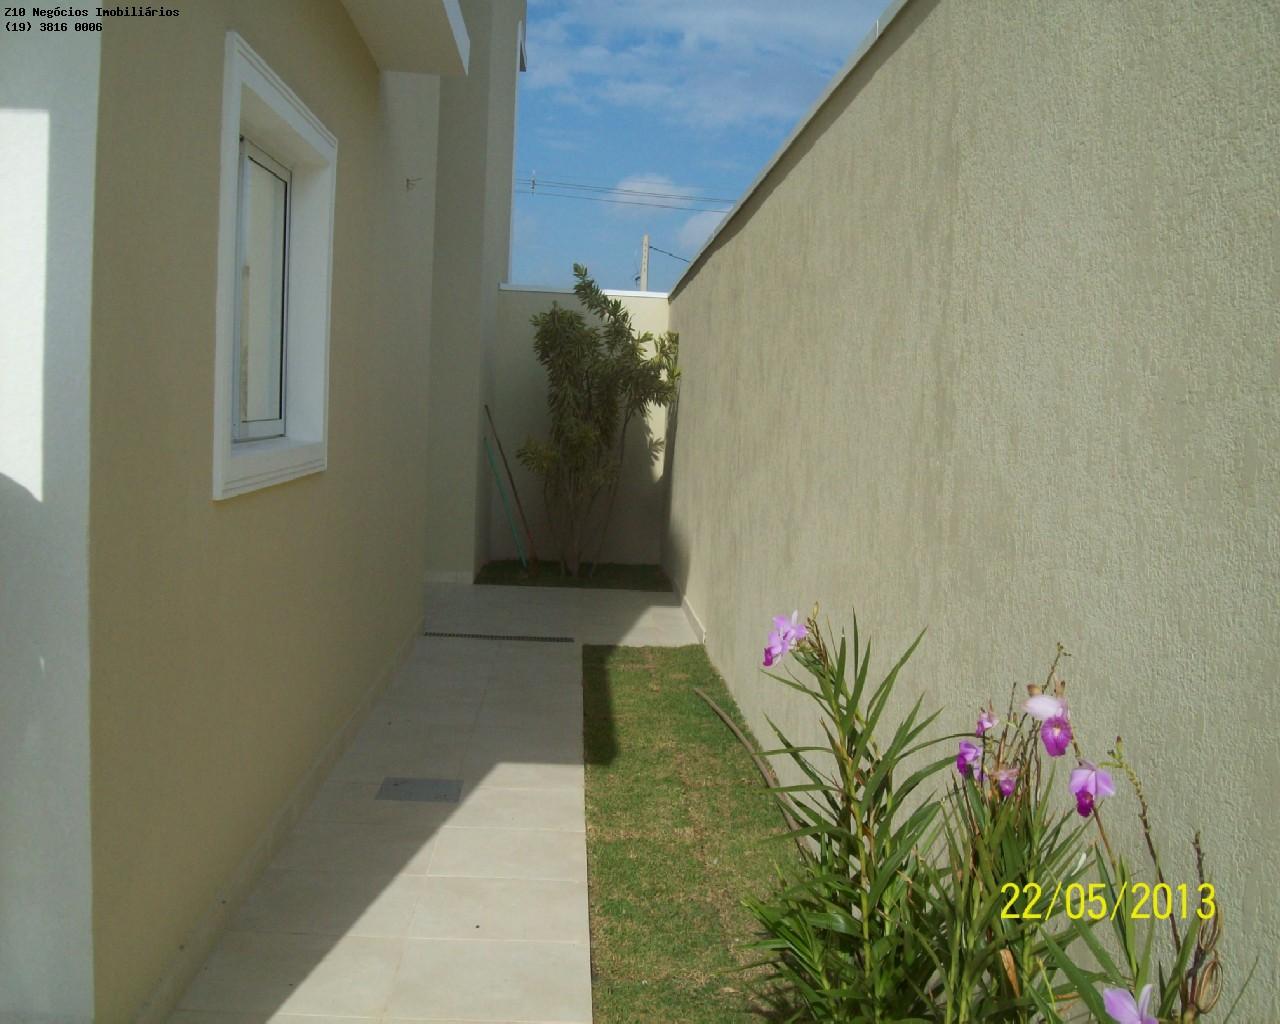 Jardim - quintal